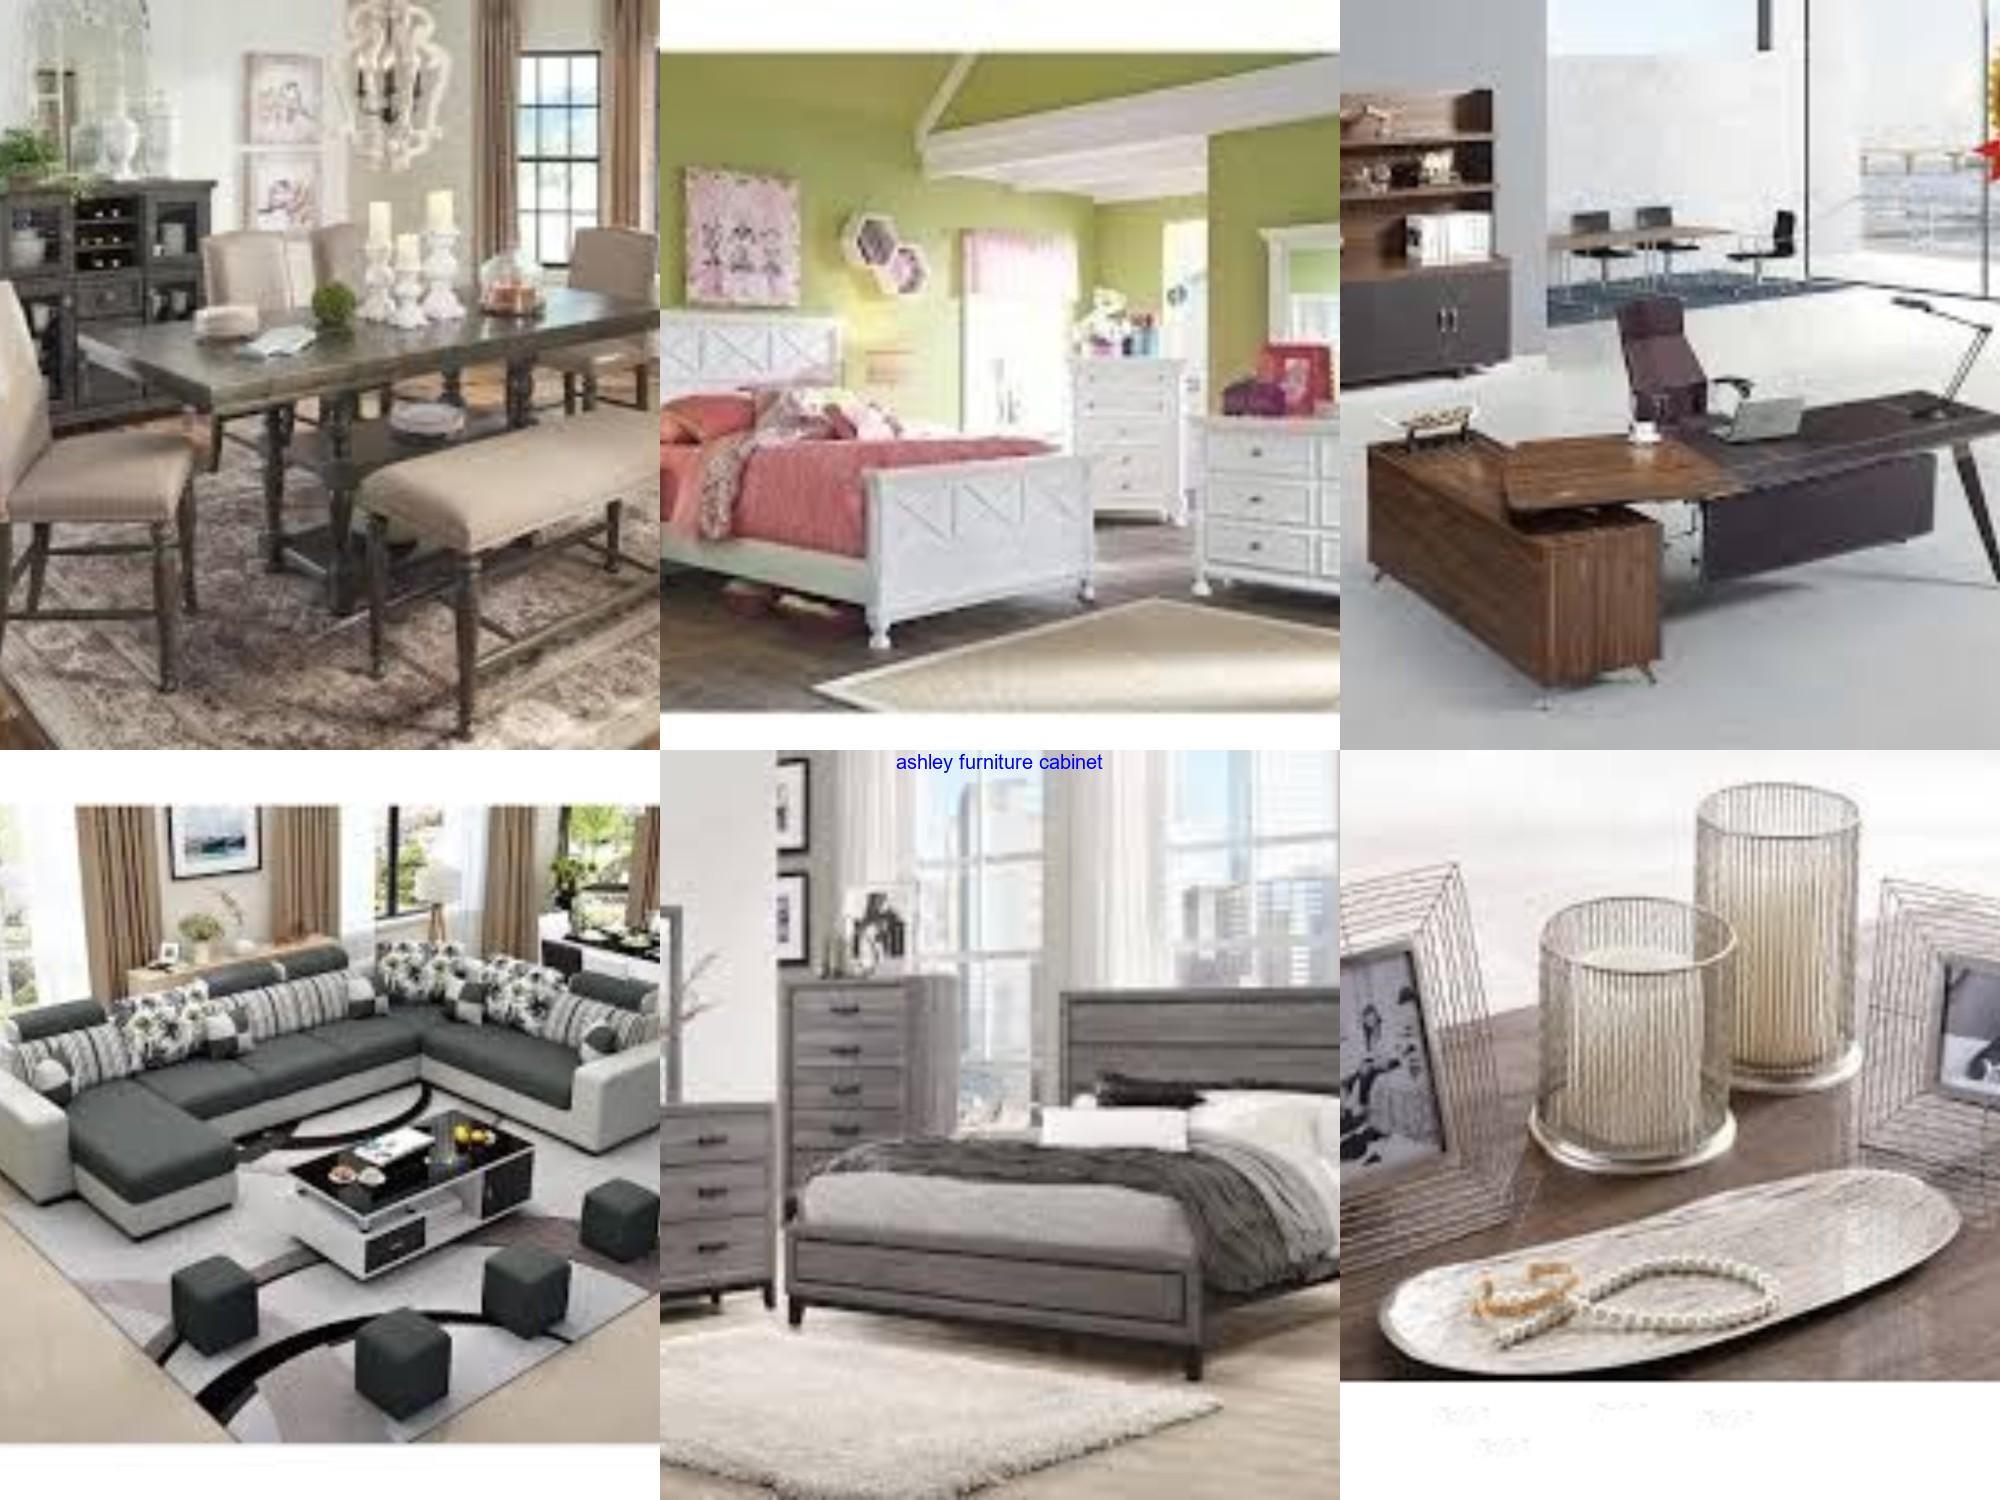 Ashley Furniture Cabinet Furniture Prices Ashley Furniture Wholesale Furniture